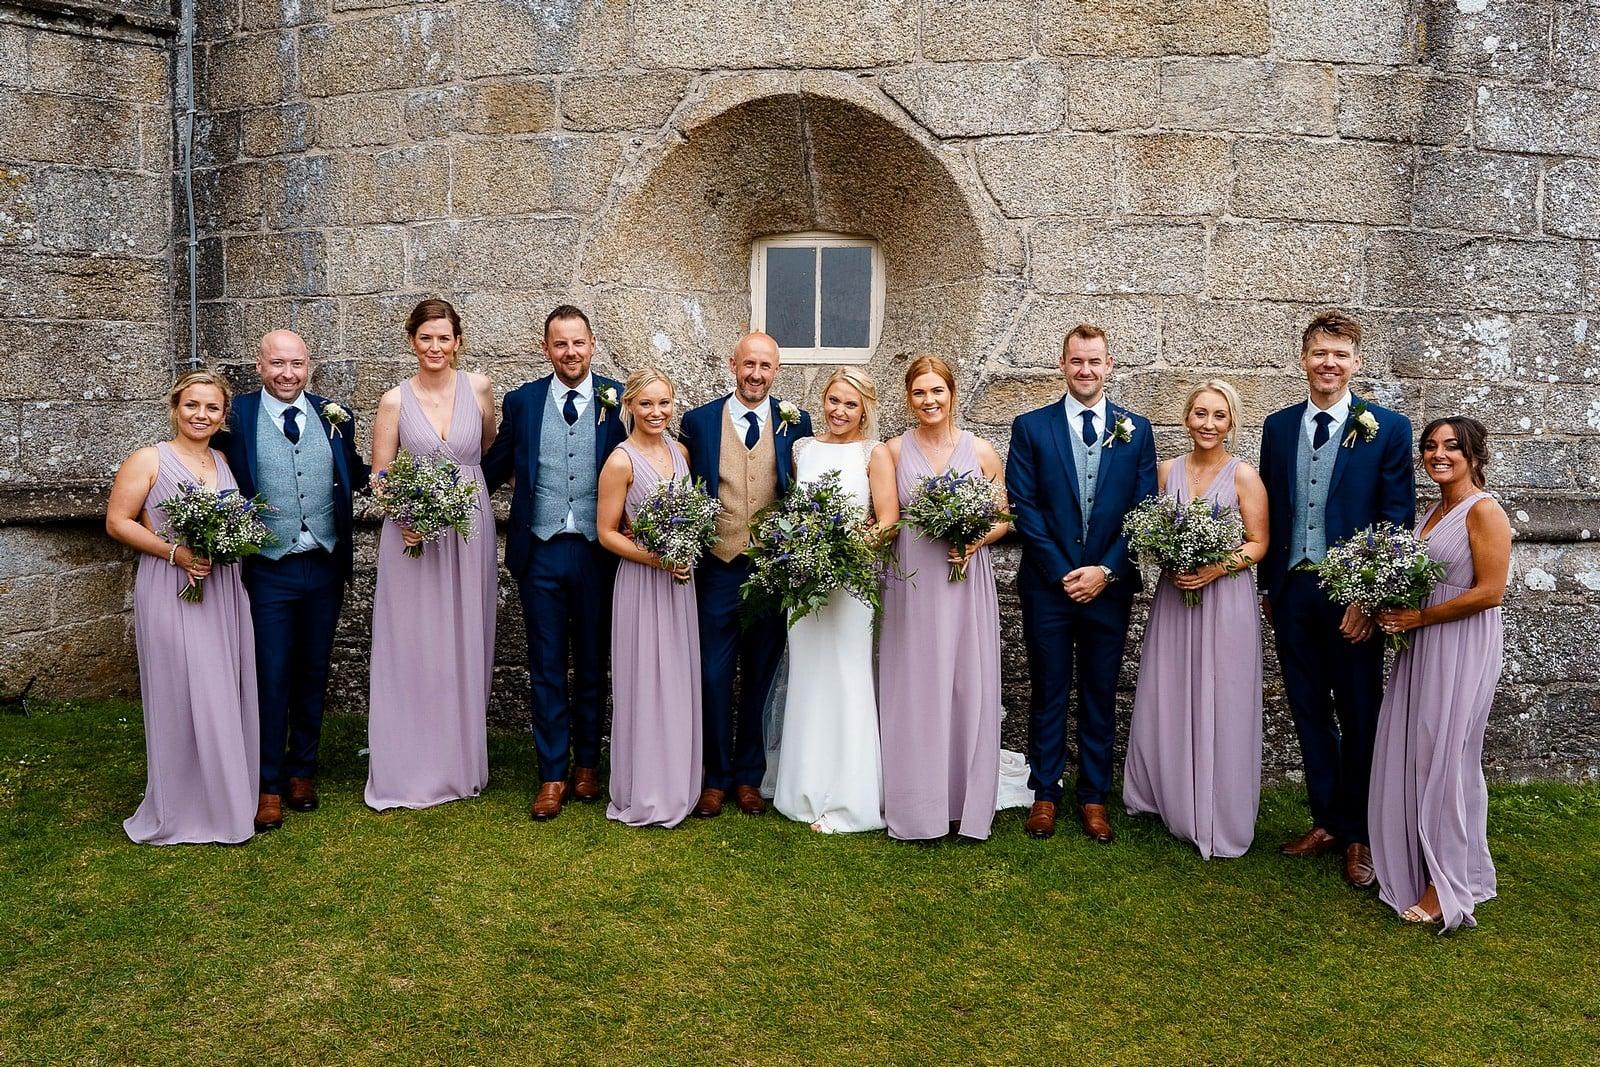 Bridal Party wedding photograph at Pendennis Castle